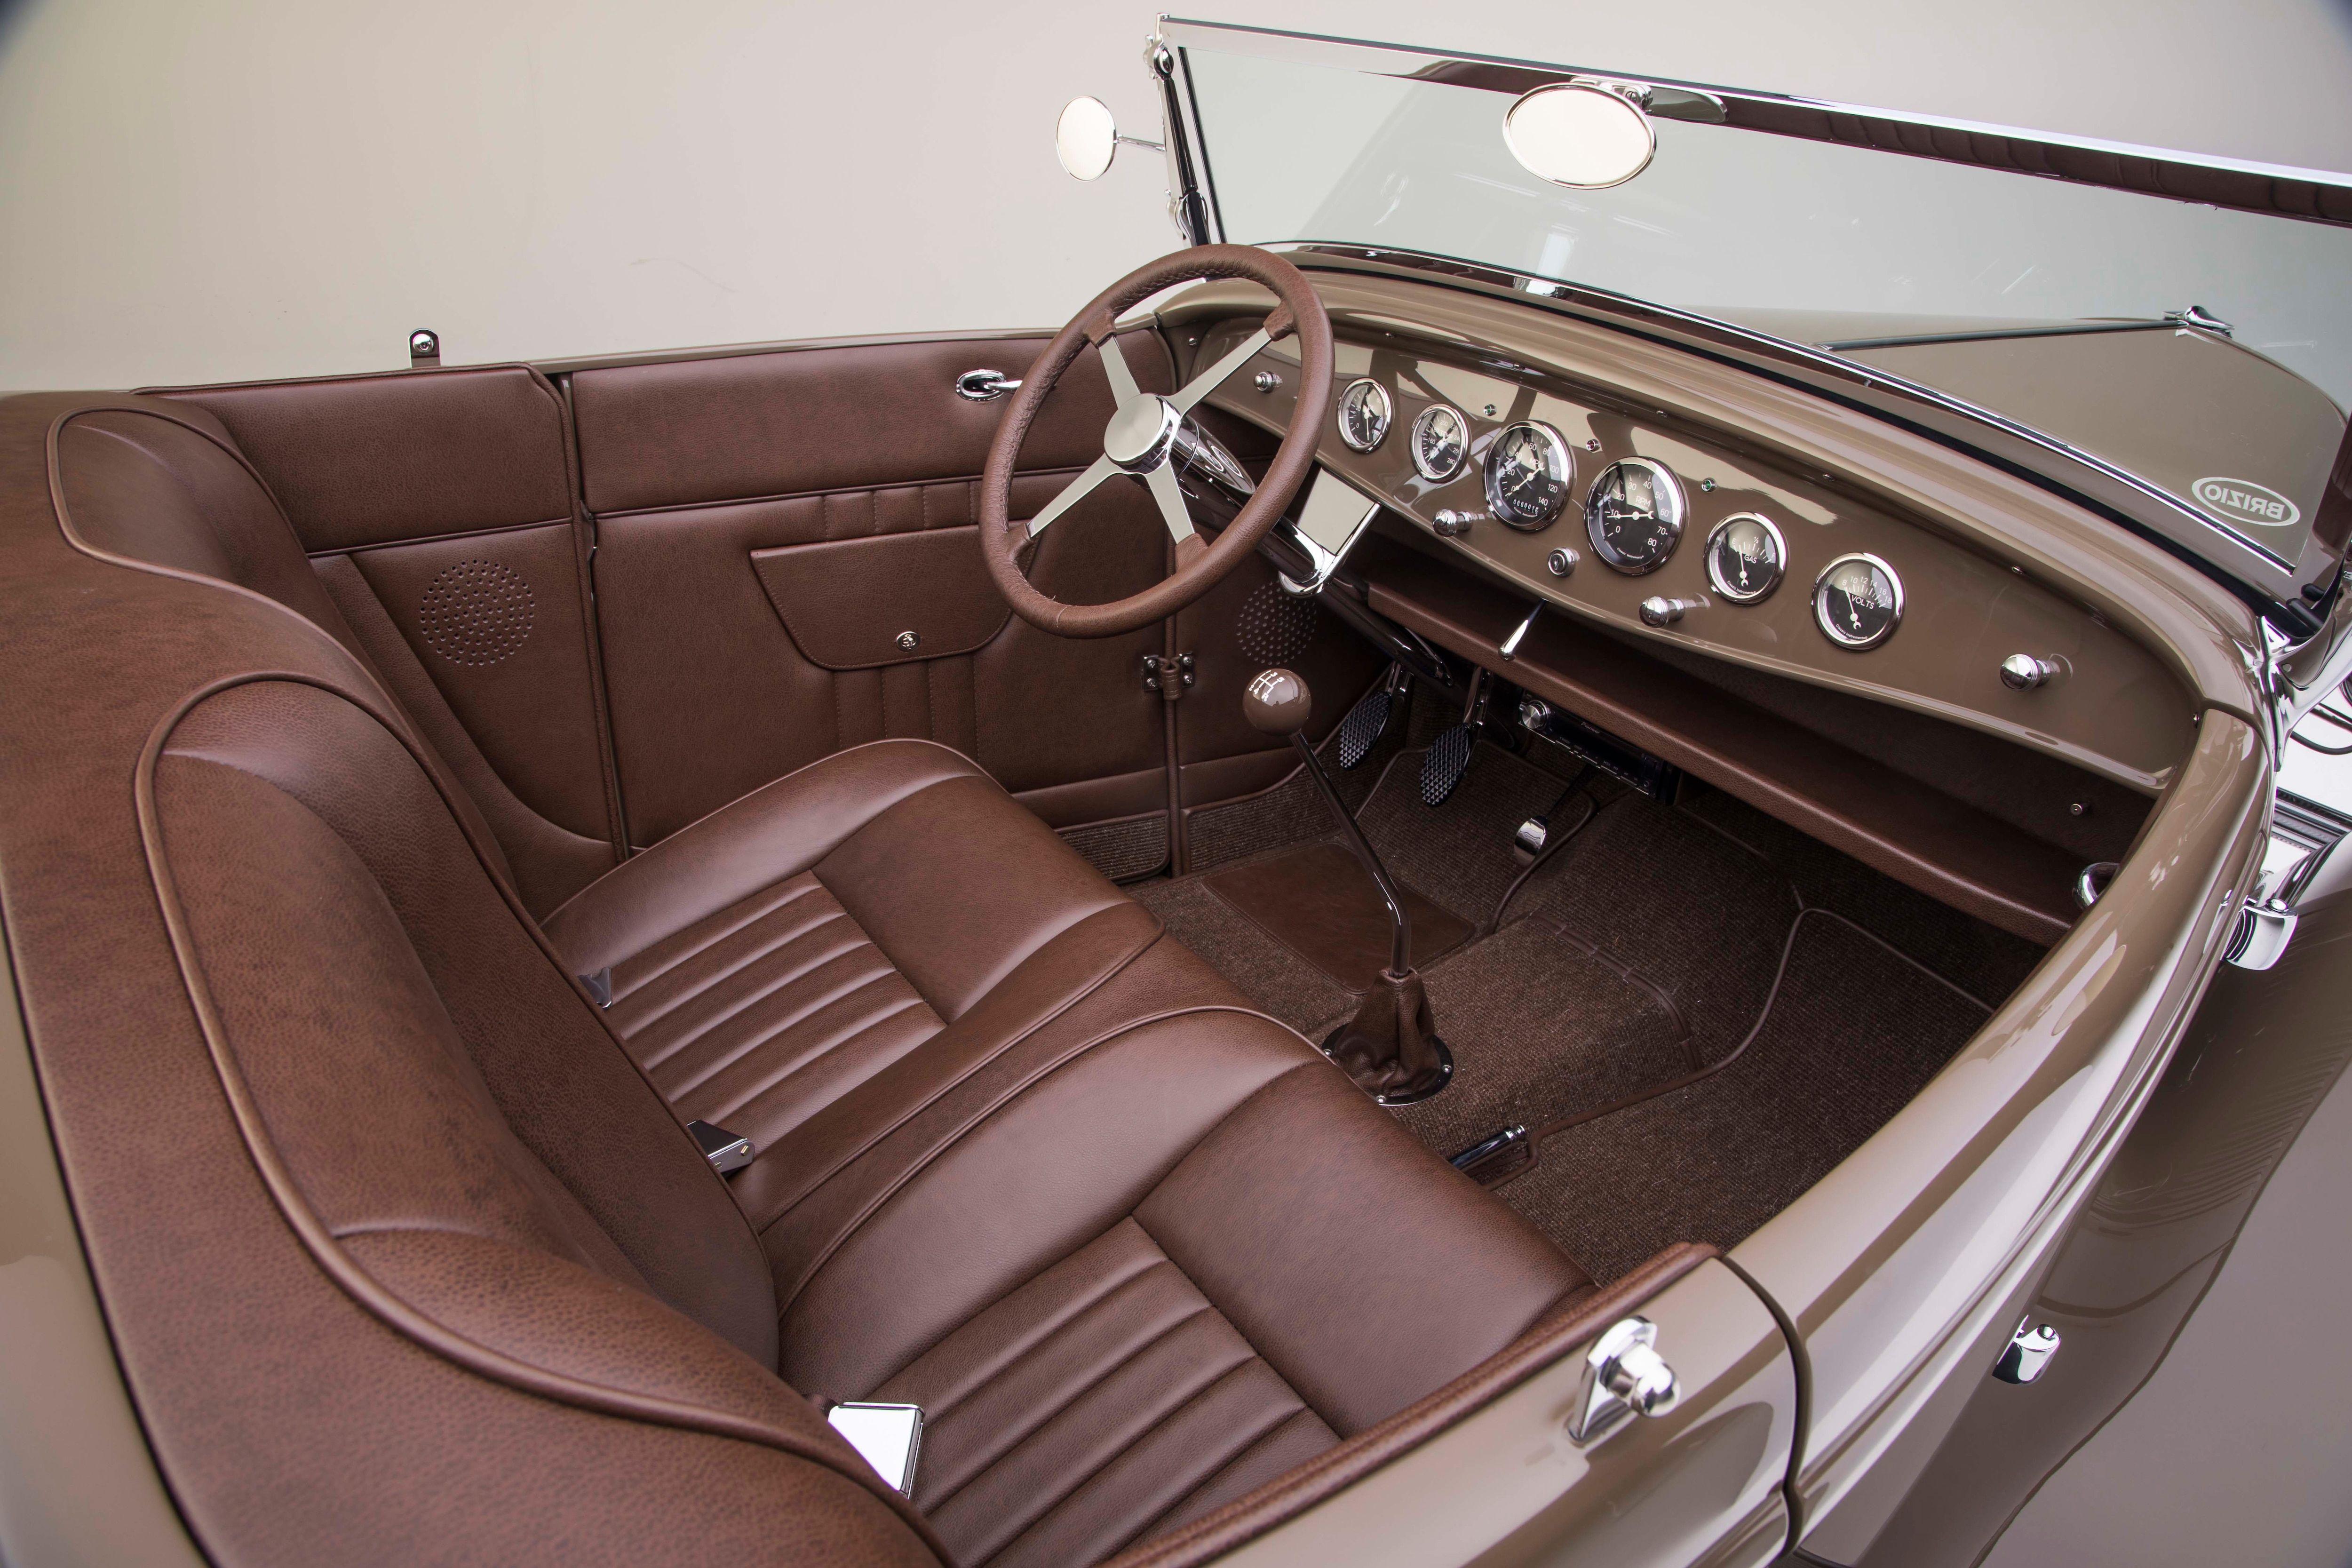 David Peggy Farmer S Brizio Built Brookville 1932 Ford Roadster Pickup Ford Roadster Roadsters 1932 Ford Roadster